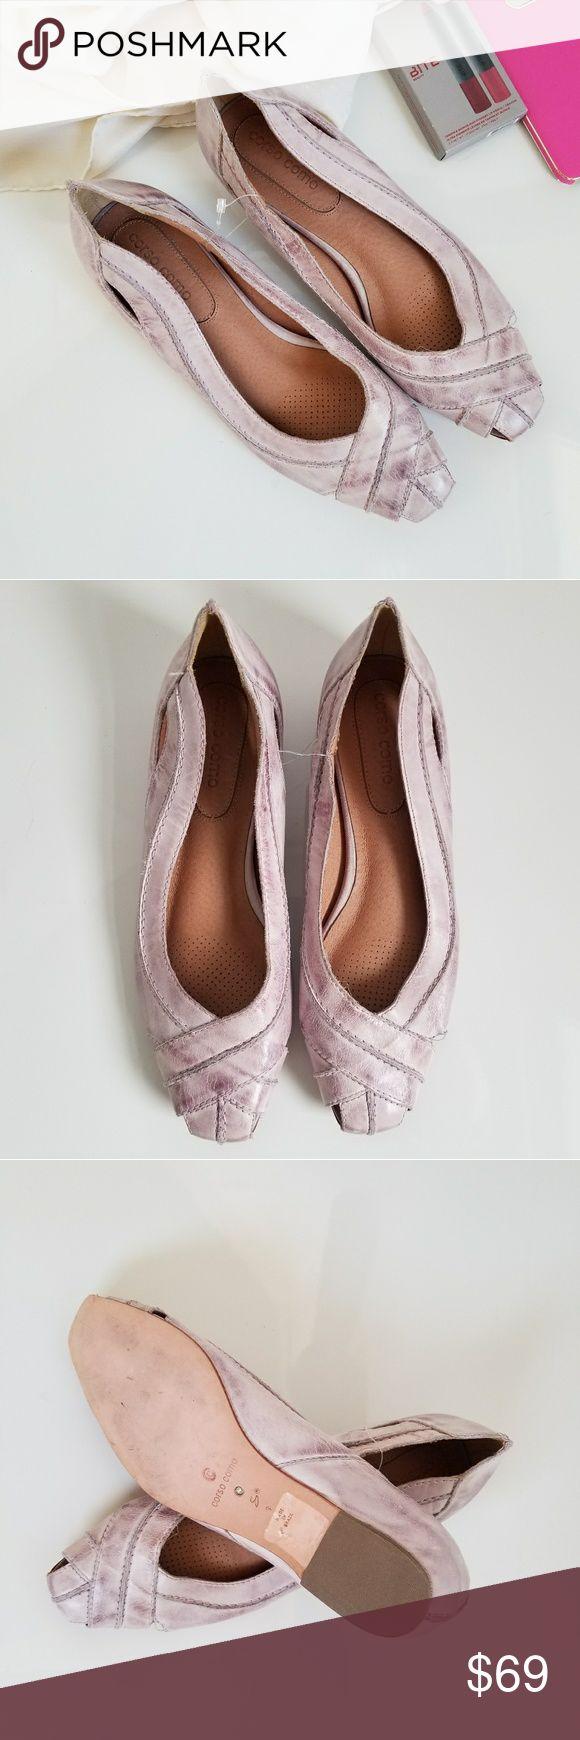 Corso Como Distressed Lavender Leather Flats Detail: Distressed leather upper Leather sole Brand new. Corso Como Shoes Flats & Loafers